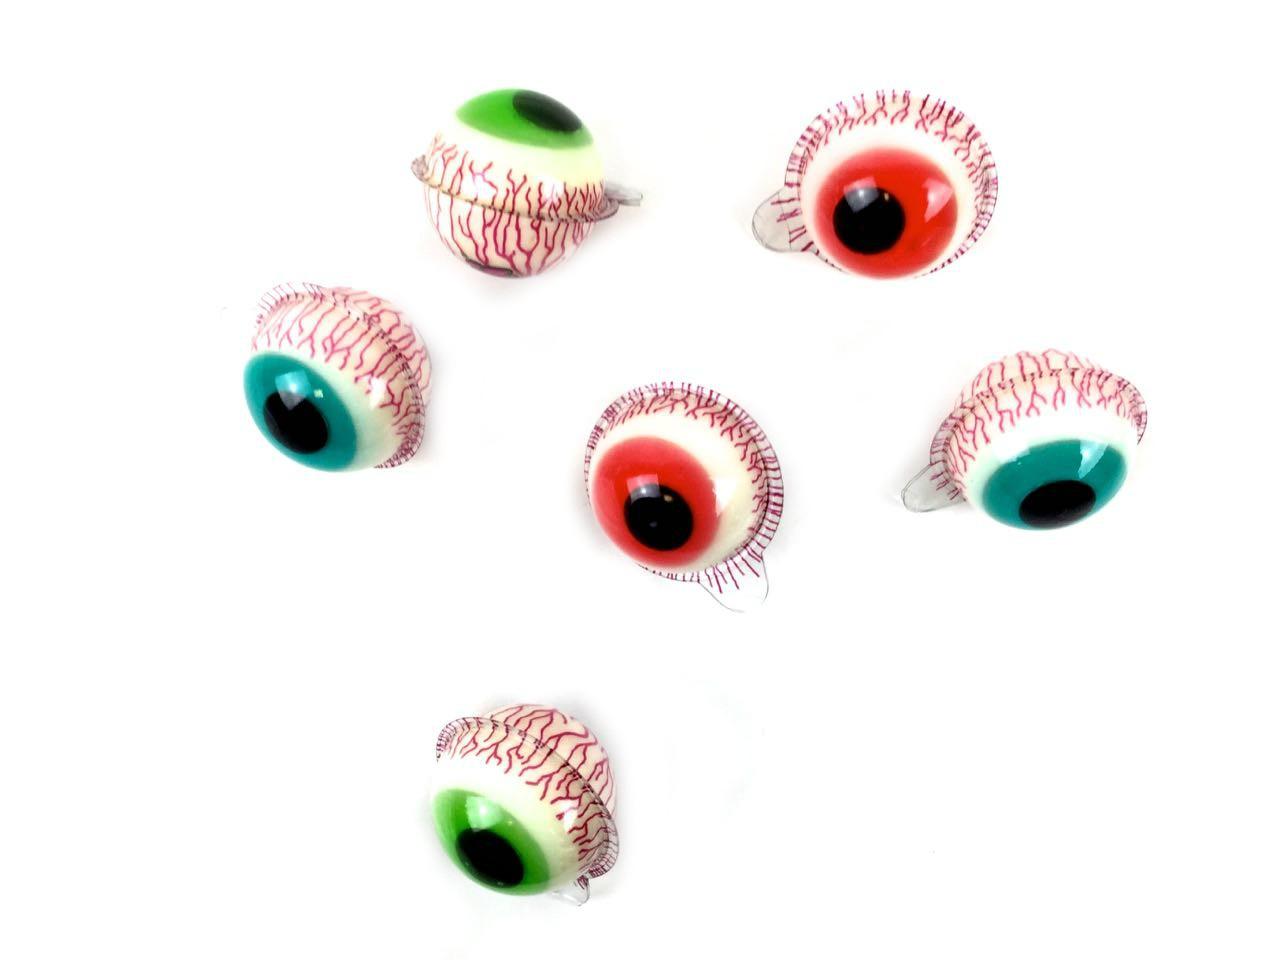 Dolciumi Halloween all'ingrosso: occhi gommosi ripieni gusto extra acido